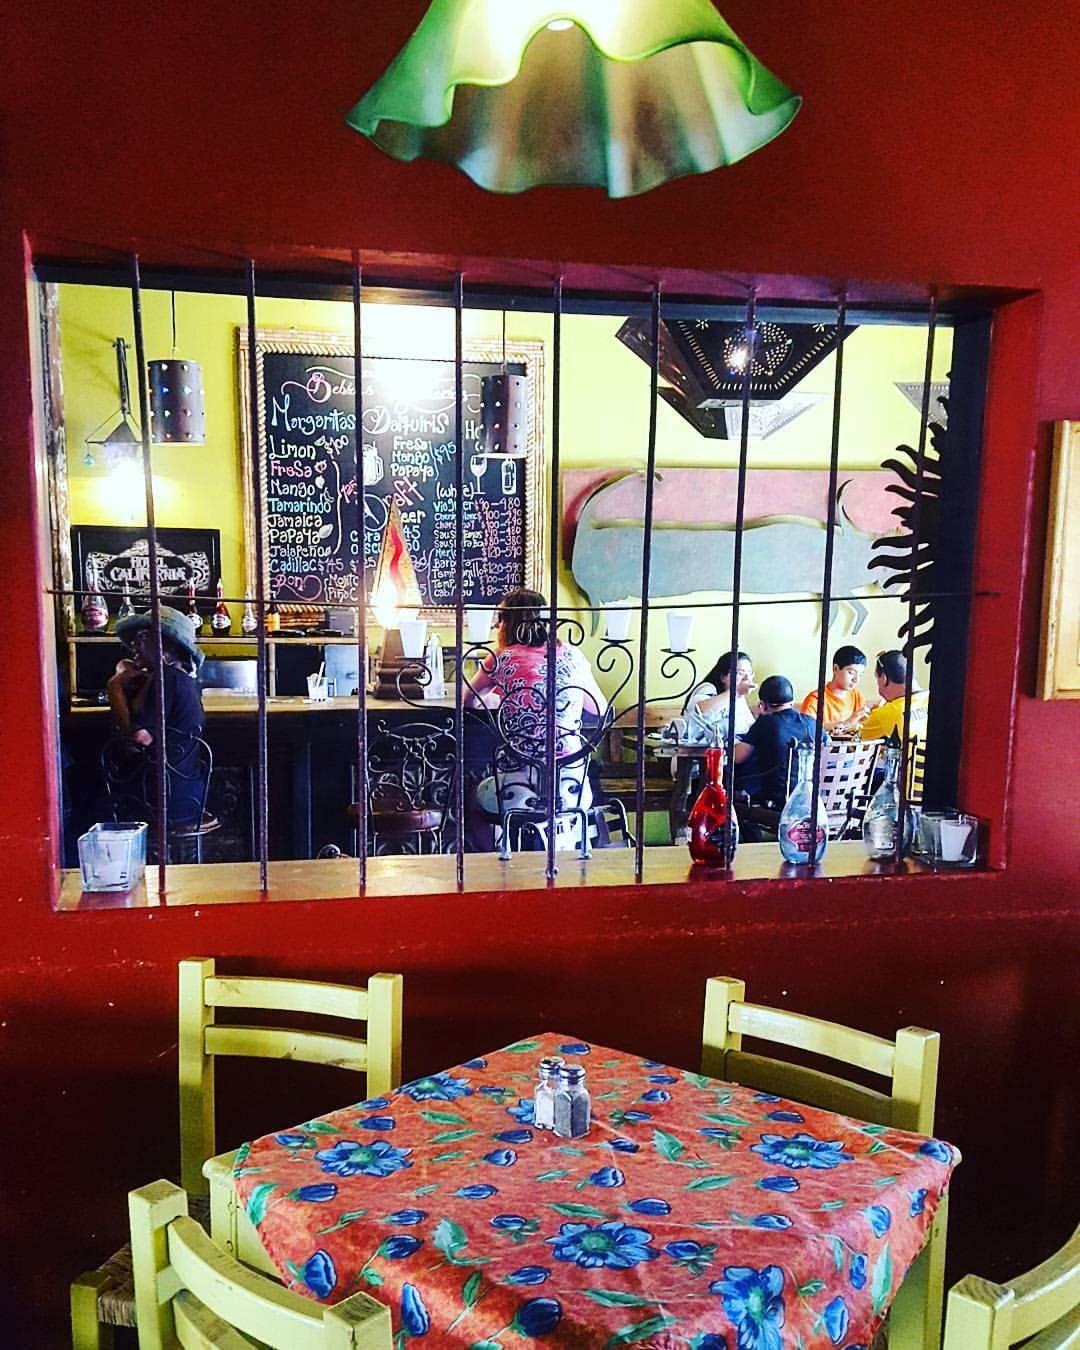 #hotelcalifornia #mexico #baha #bajacalifornia #bajacaliforniasur #2017summer #happy #donetsk  #fromdonetsk  @ Hotel Californ...